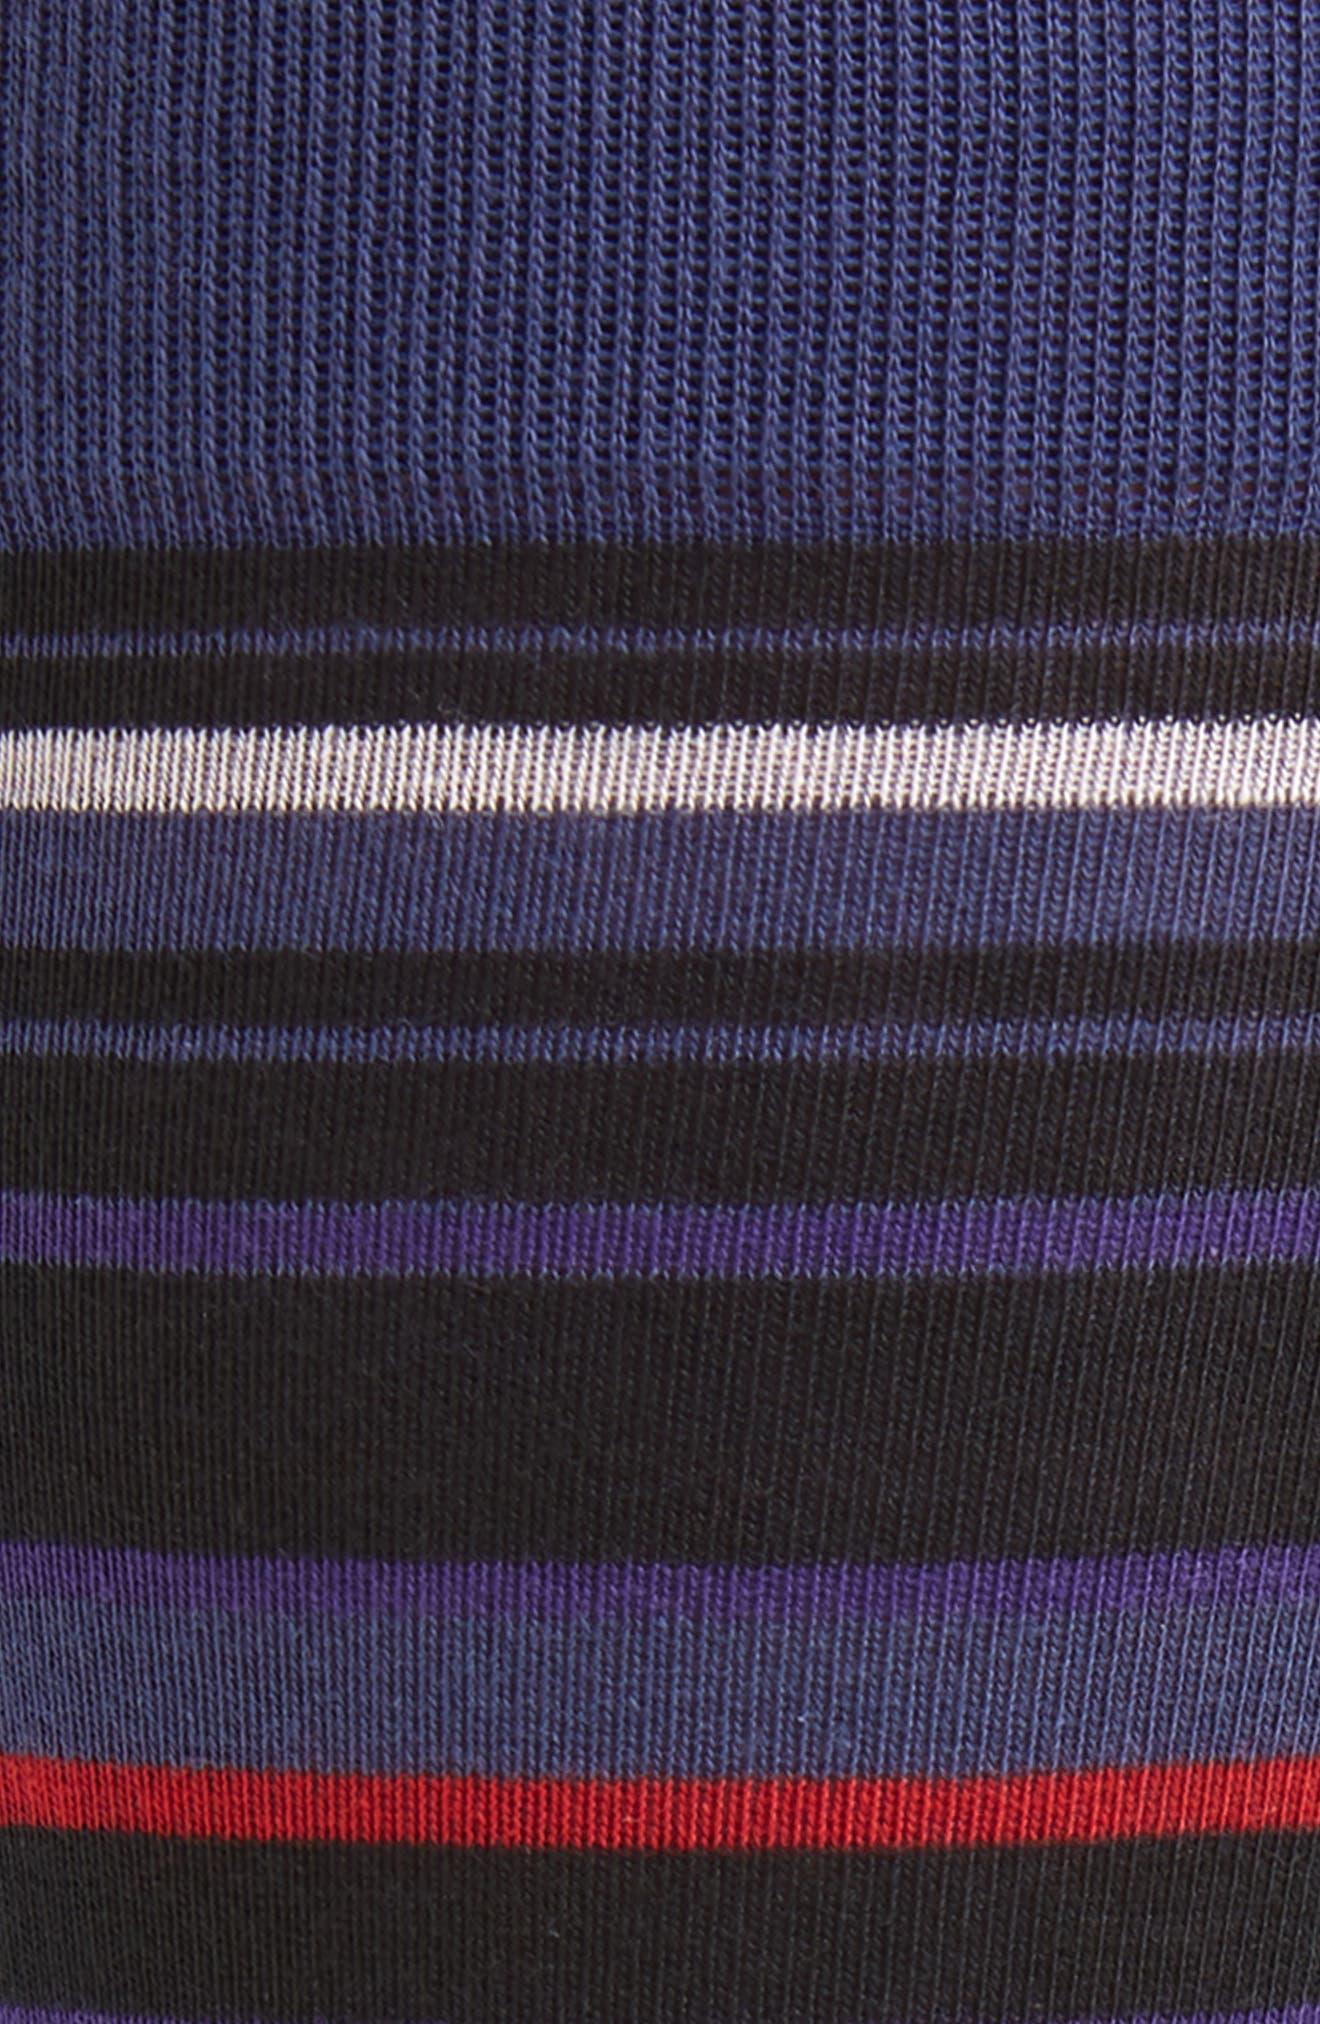 Stripe Socks,                             Alternate thumbnail 2, color,                             501